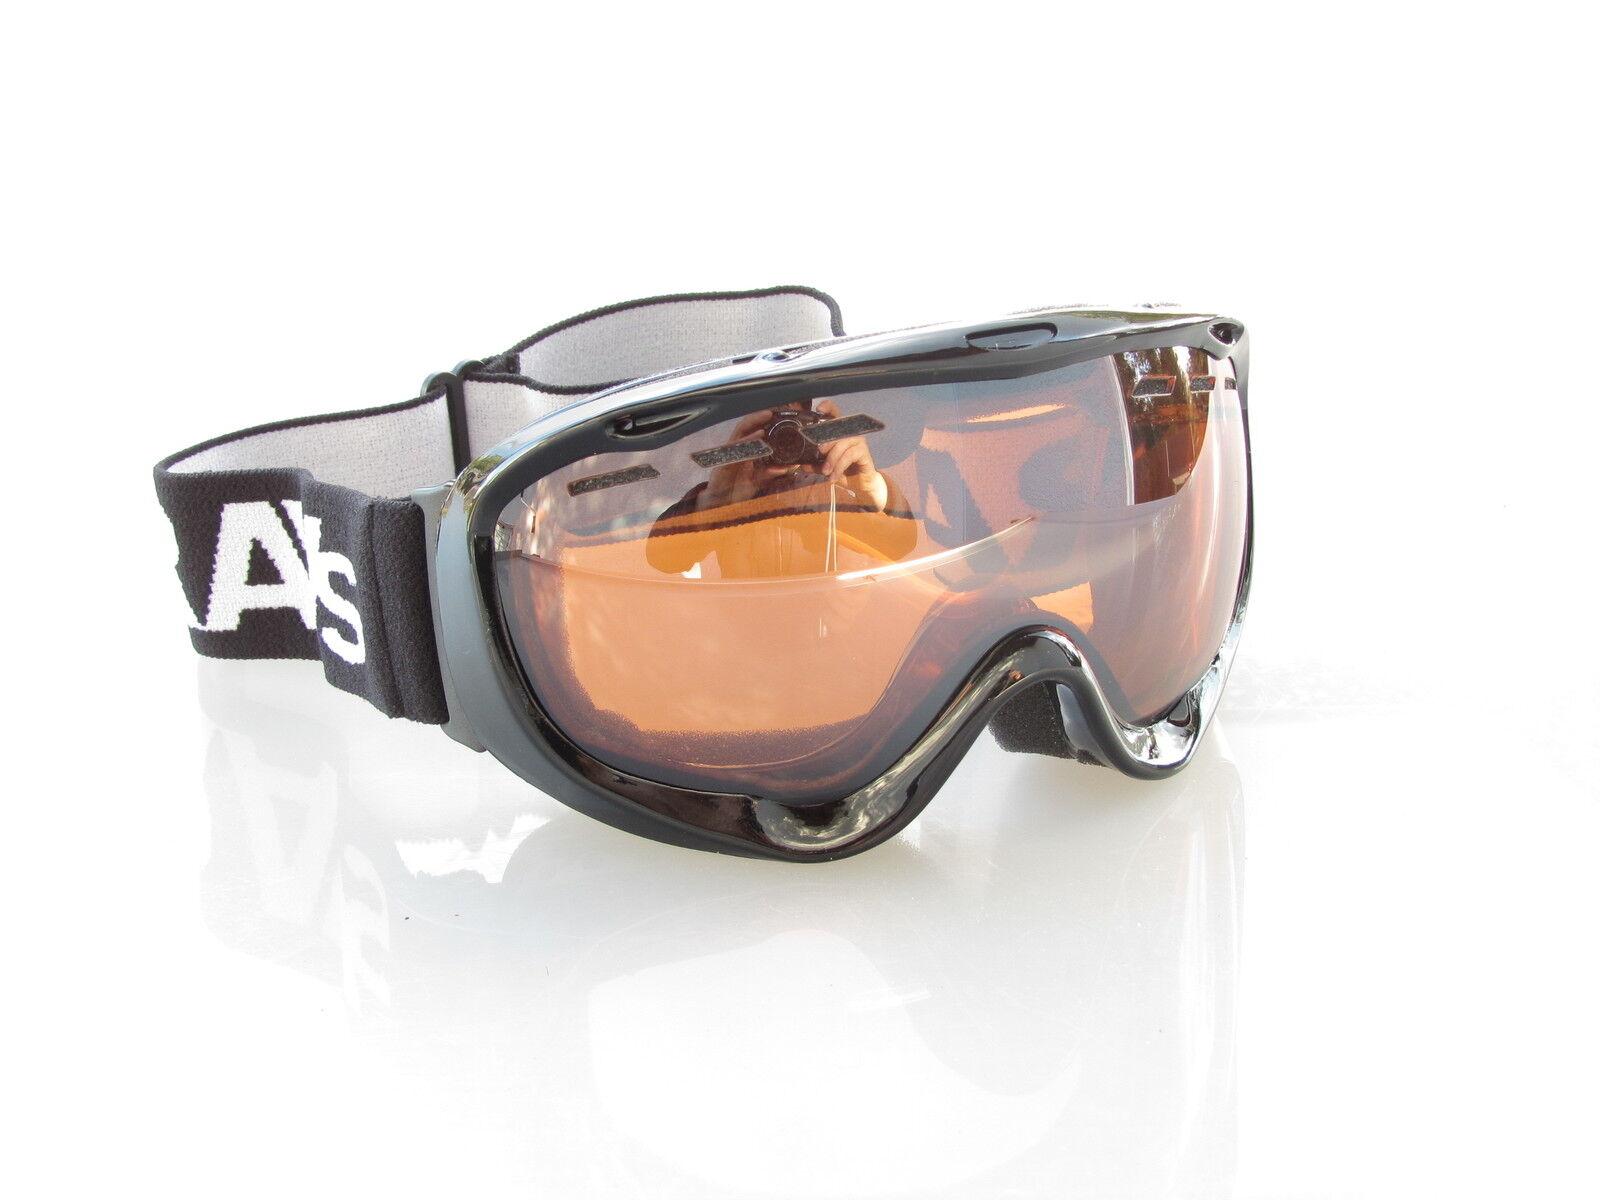 Ravs Ski Goggles - Snowboard - Kontrastverstaerke Glasses Boots Alpine